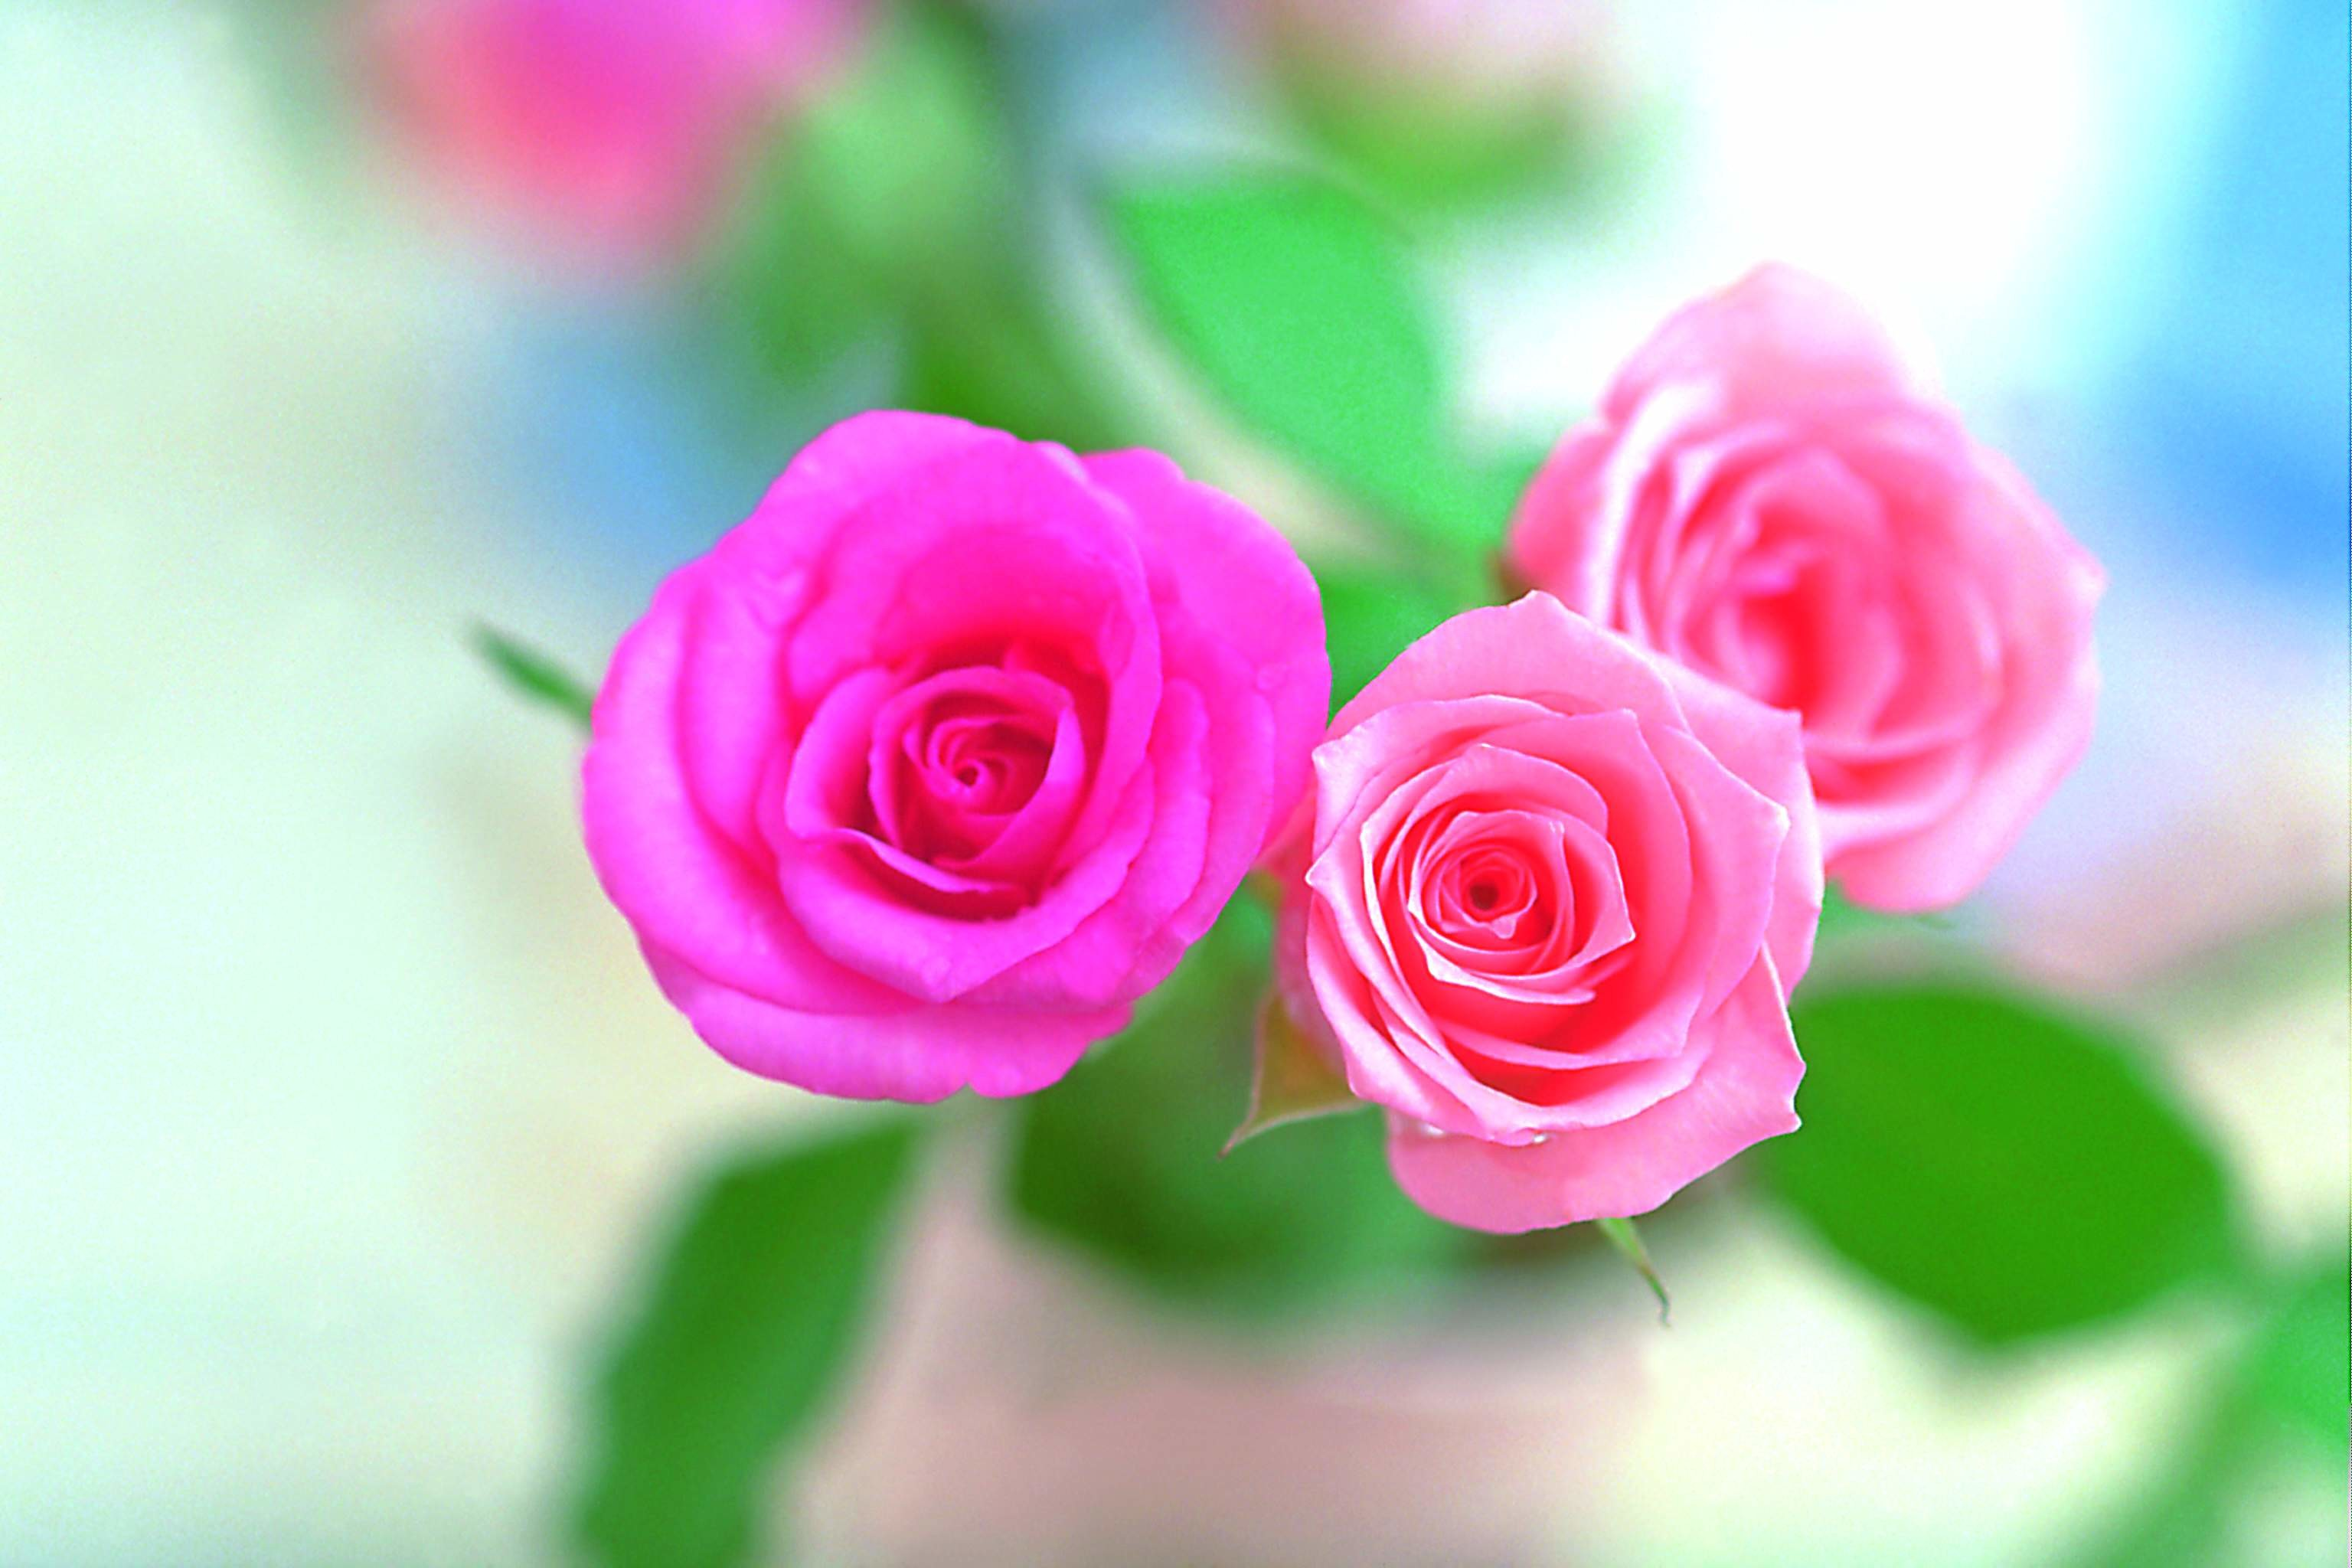 Rose Flower Wallpaper Hd 1